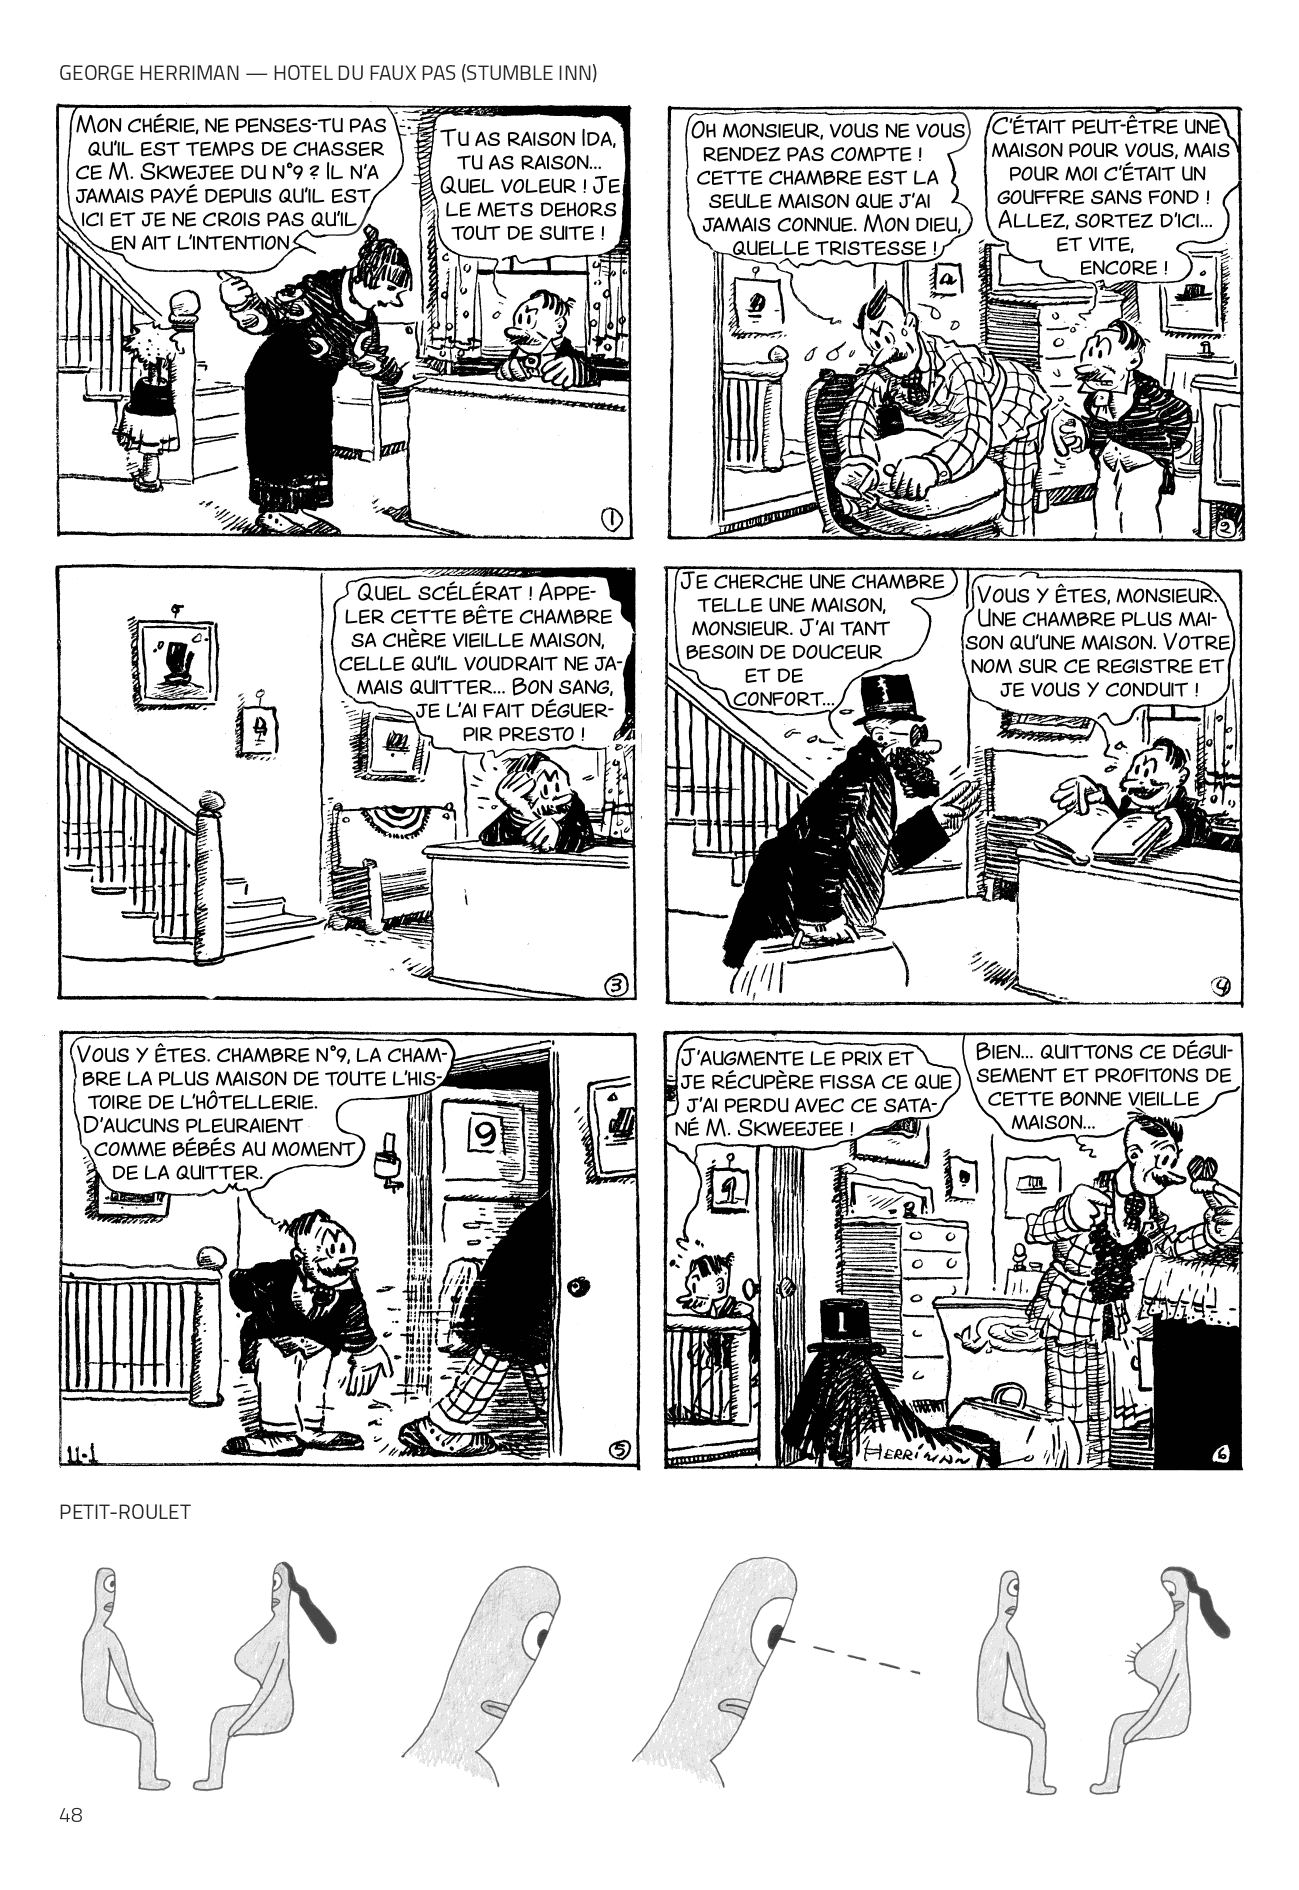 George Herriman + Petit-Roulet